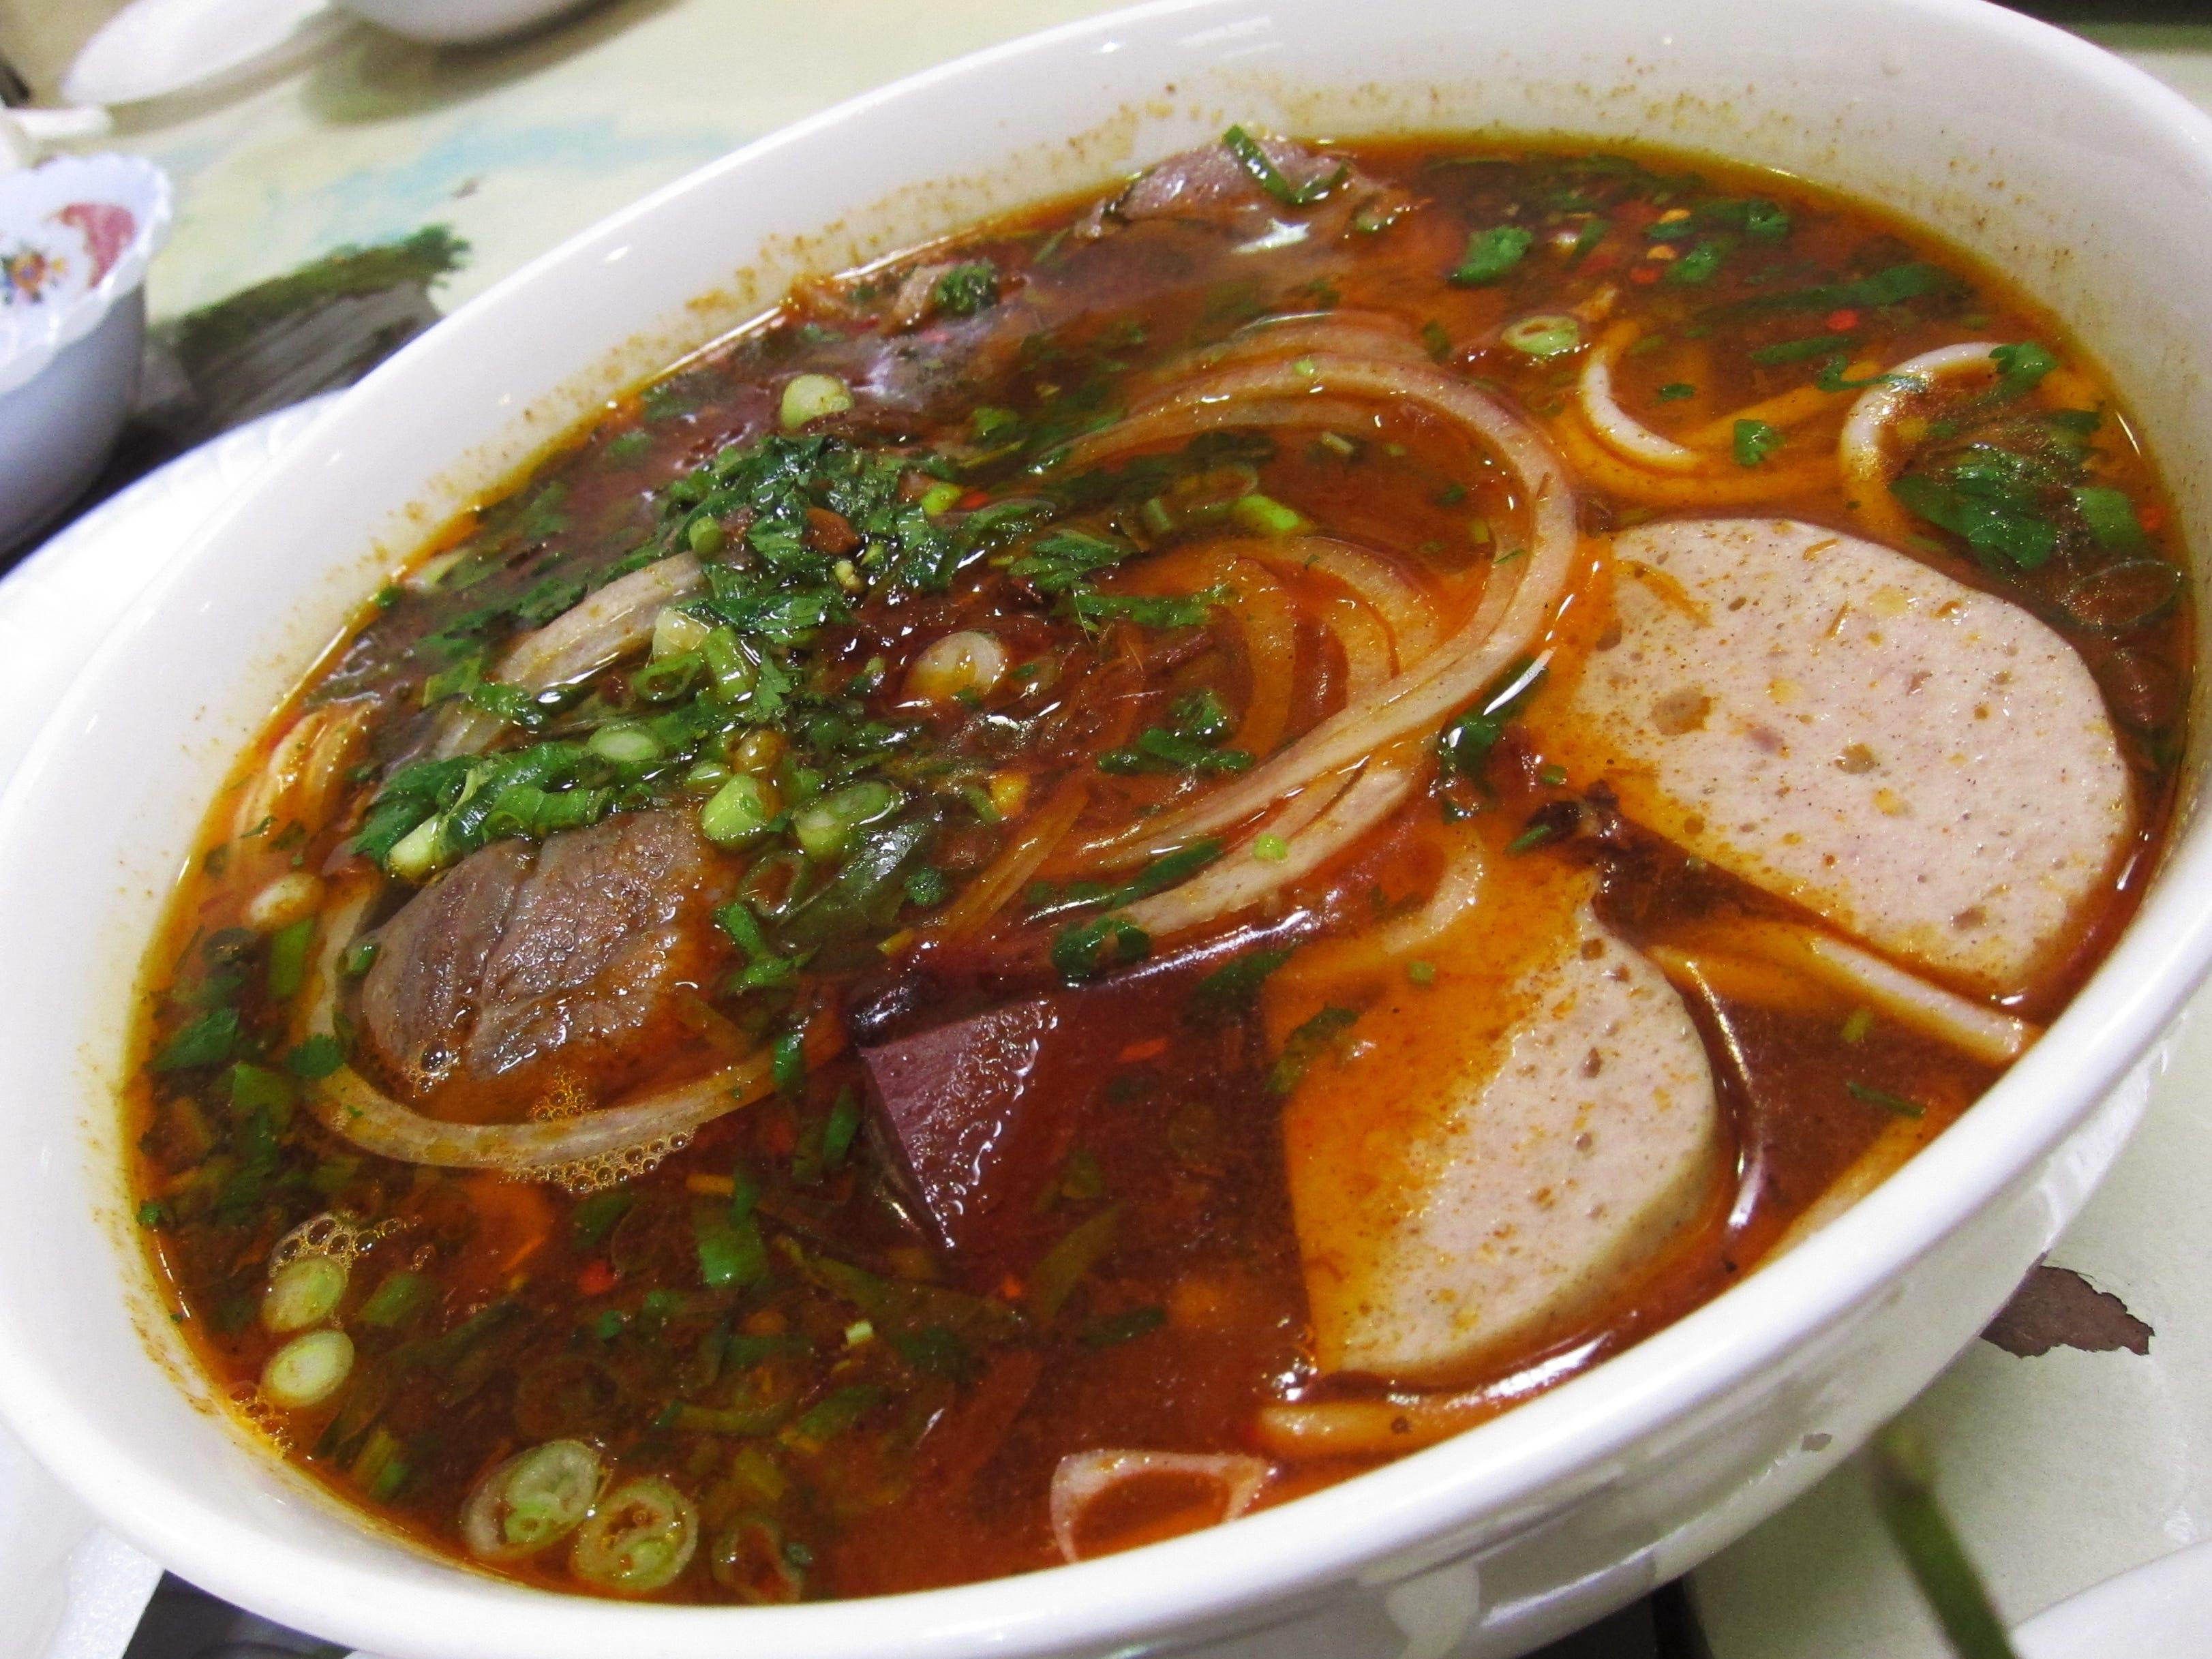 Bun bo hue (spicy beef noodle soup) at Hue Gourmet in Mesa, AZ.